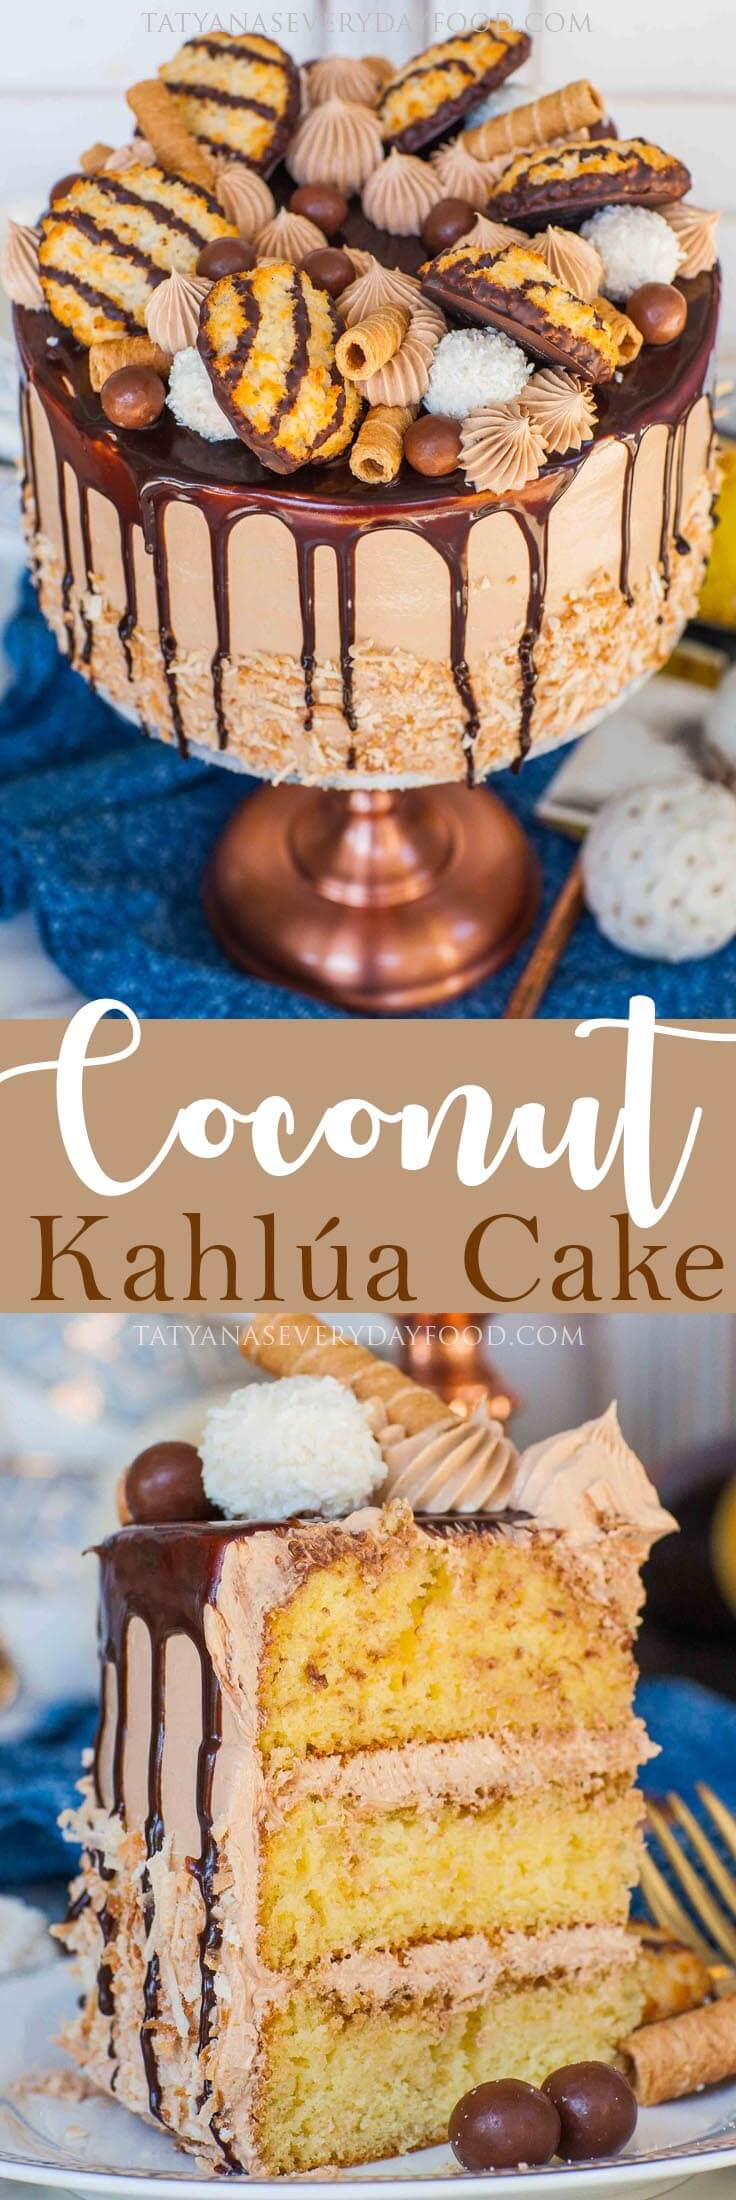 Coconut Kahlua Cake video recipe